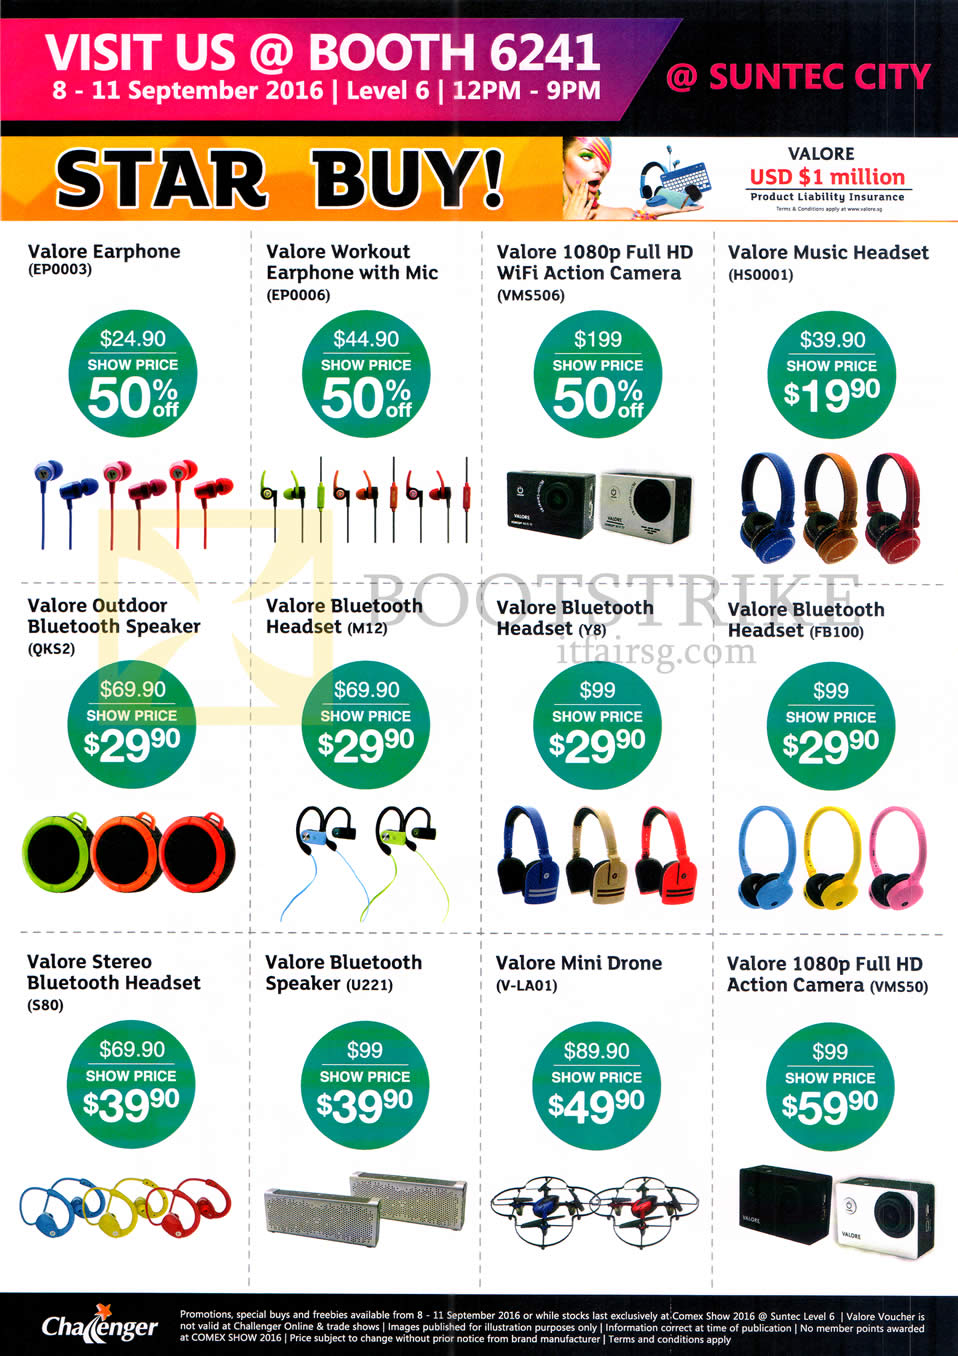 COMEX 2016 price list image brochure of Challenger Valore Earphones, Headphones, Speakers, Valore Earphone, Workout, Music Headset, Bluetooth Headset, Mini Drone, 1080p Full HD Action Camera